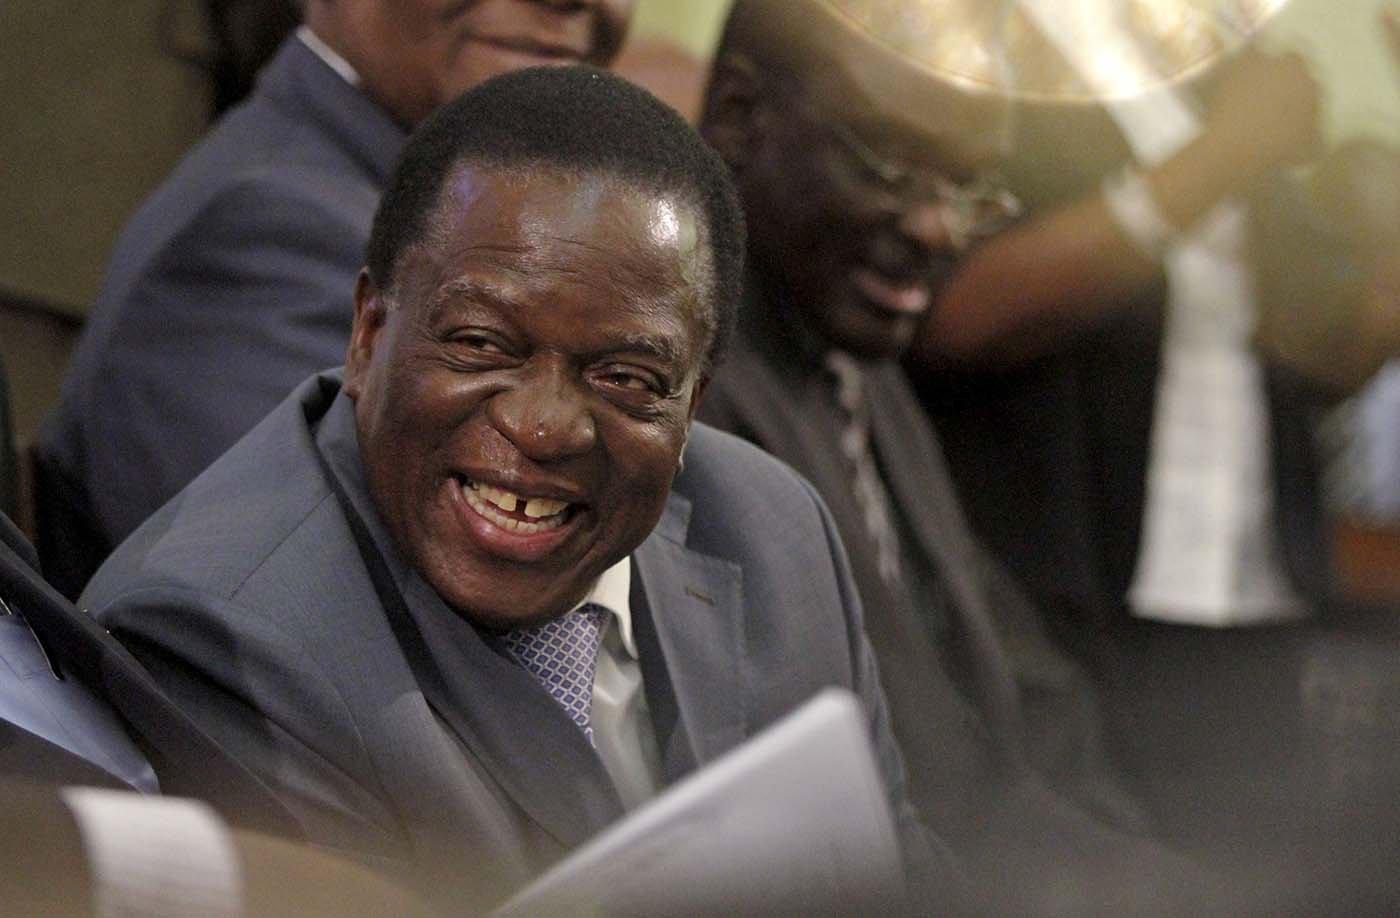 Emmerson Mnangagwa REUTERS/Philimon Bulawayo/File Photo